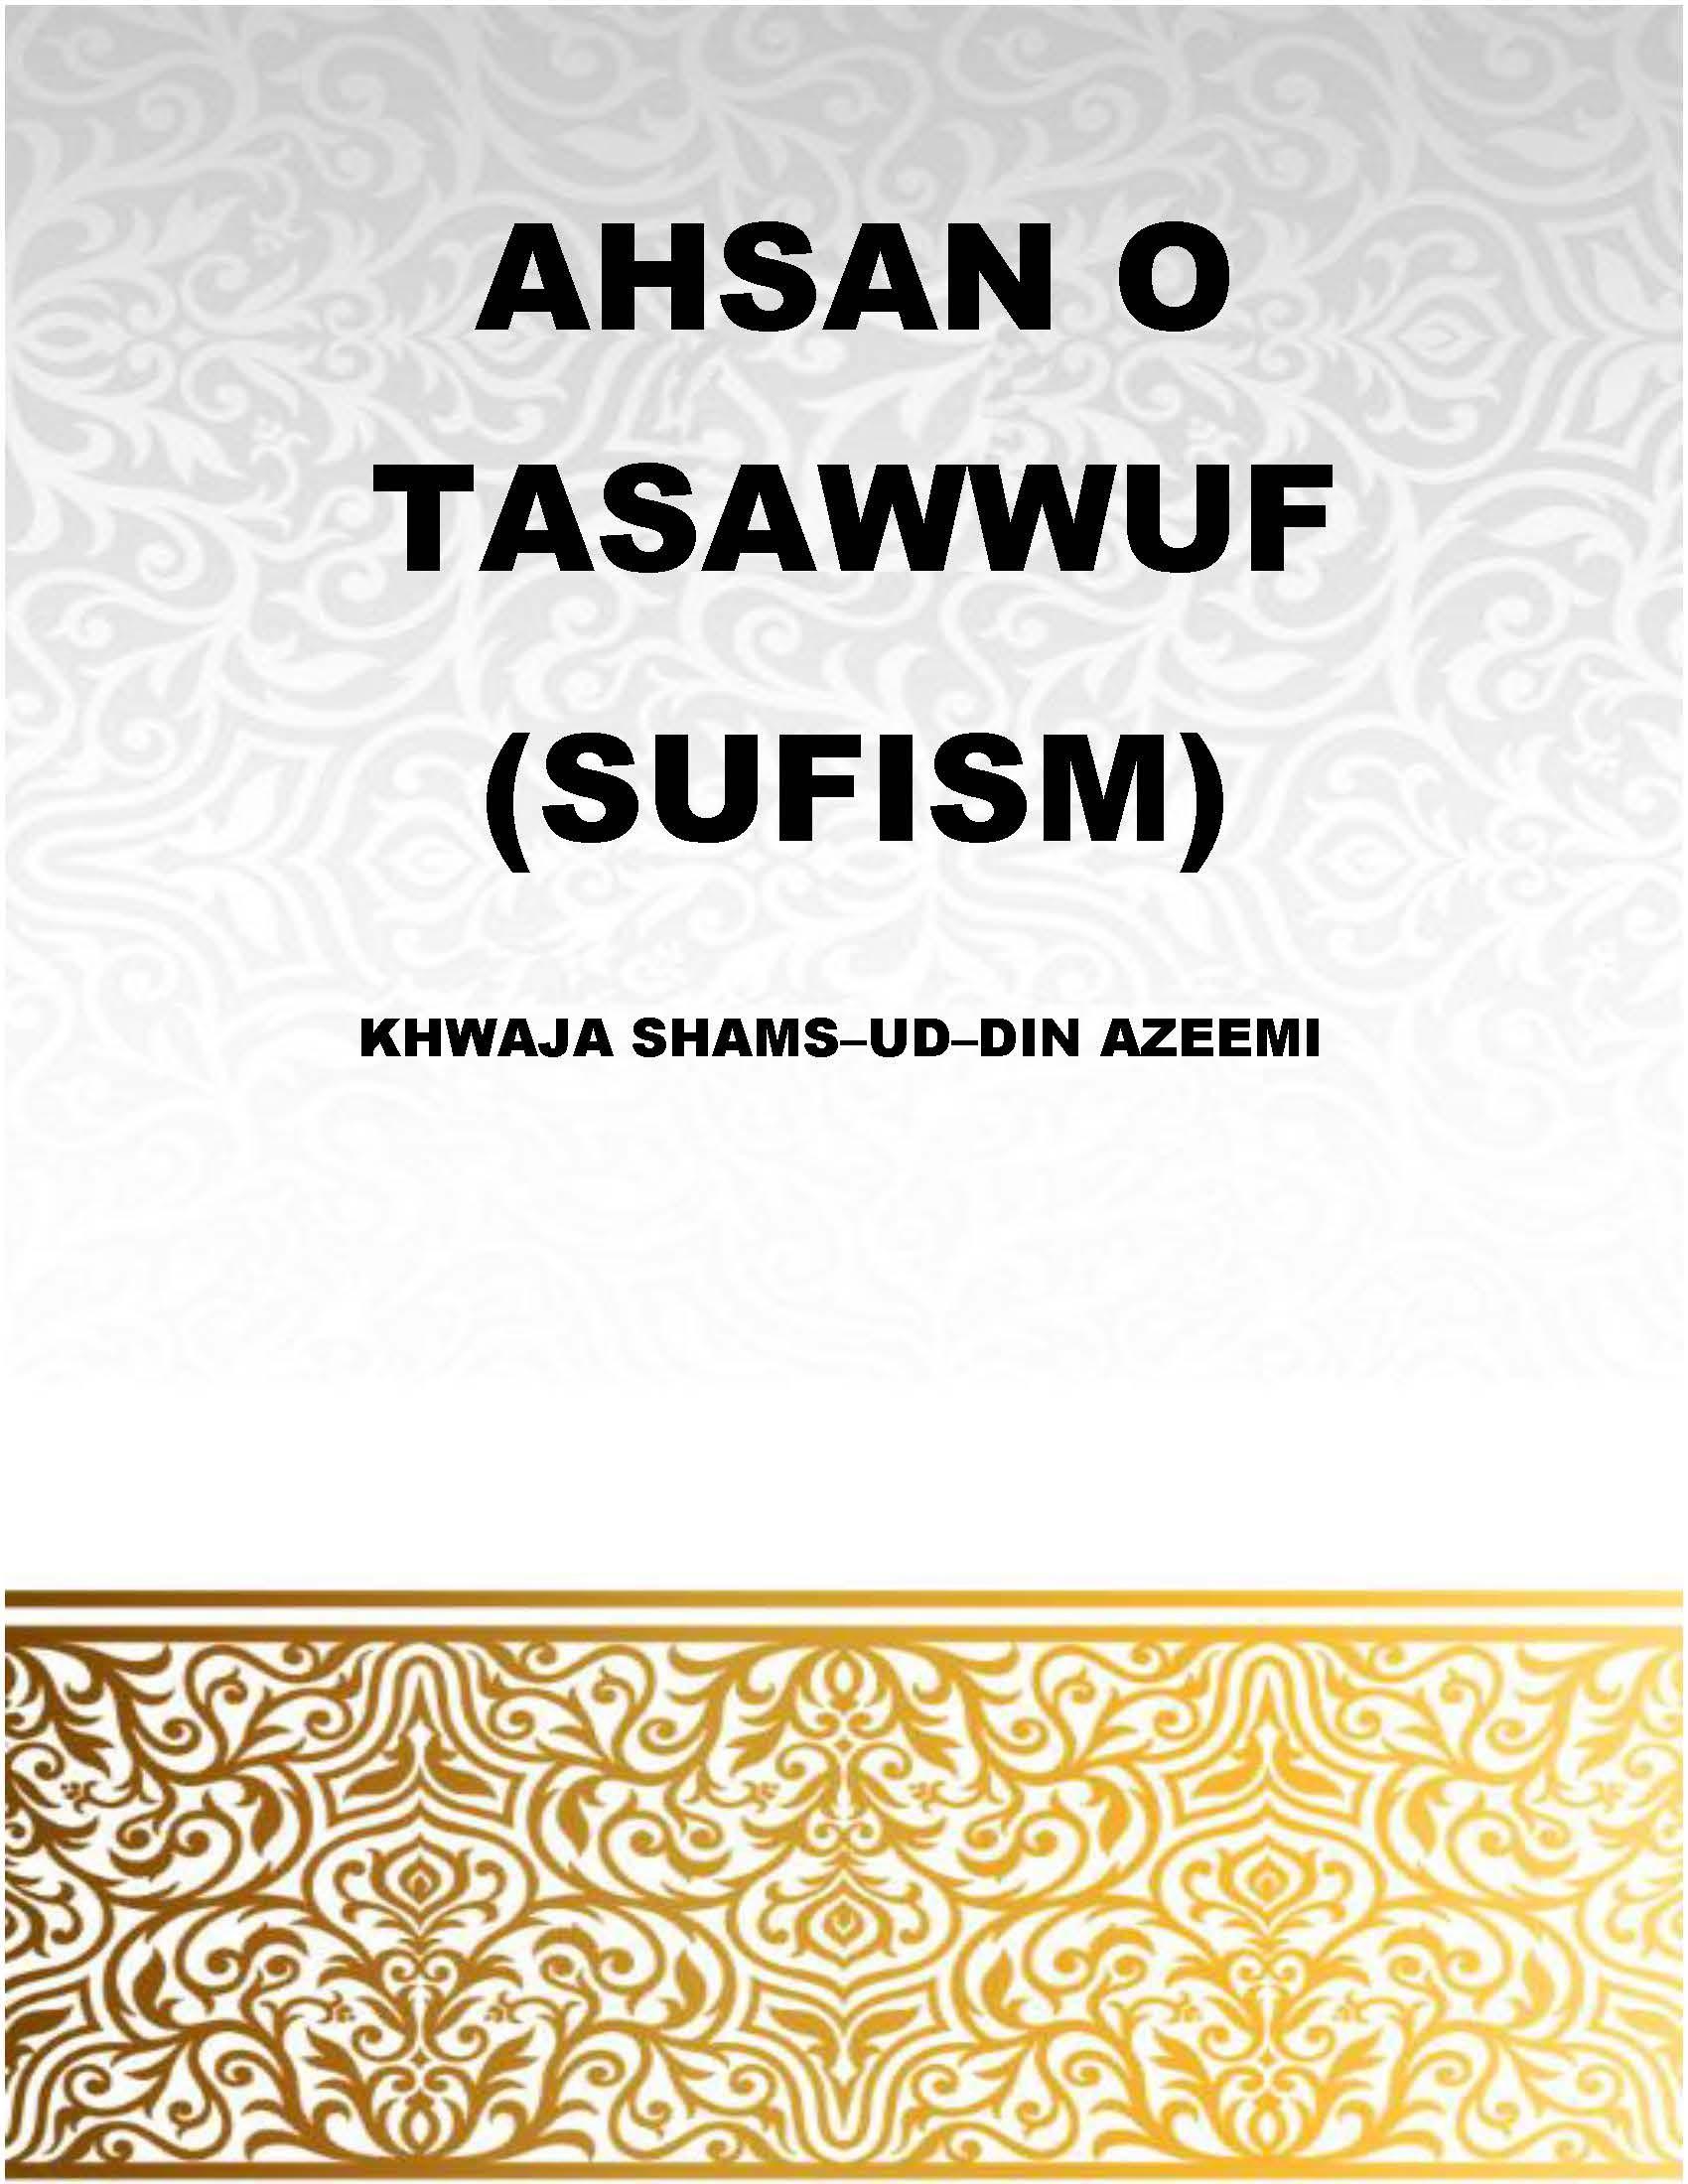 Ahsan o Tasawuf (sufism)